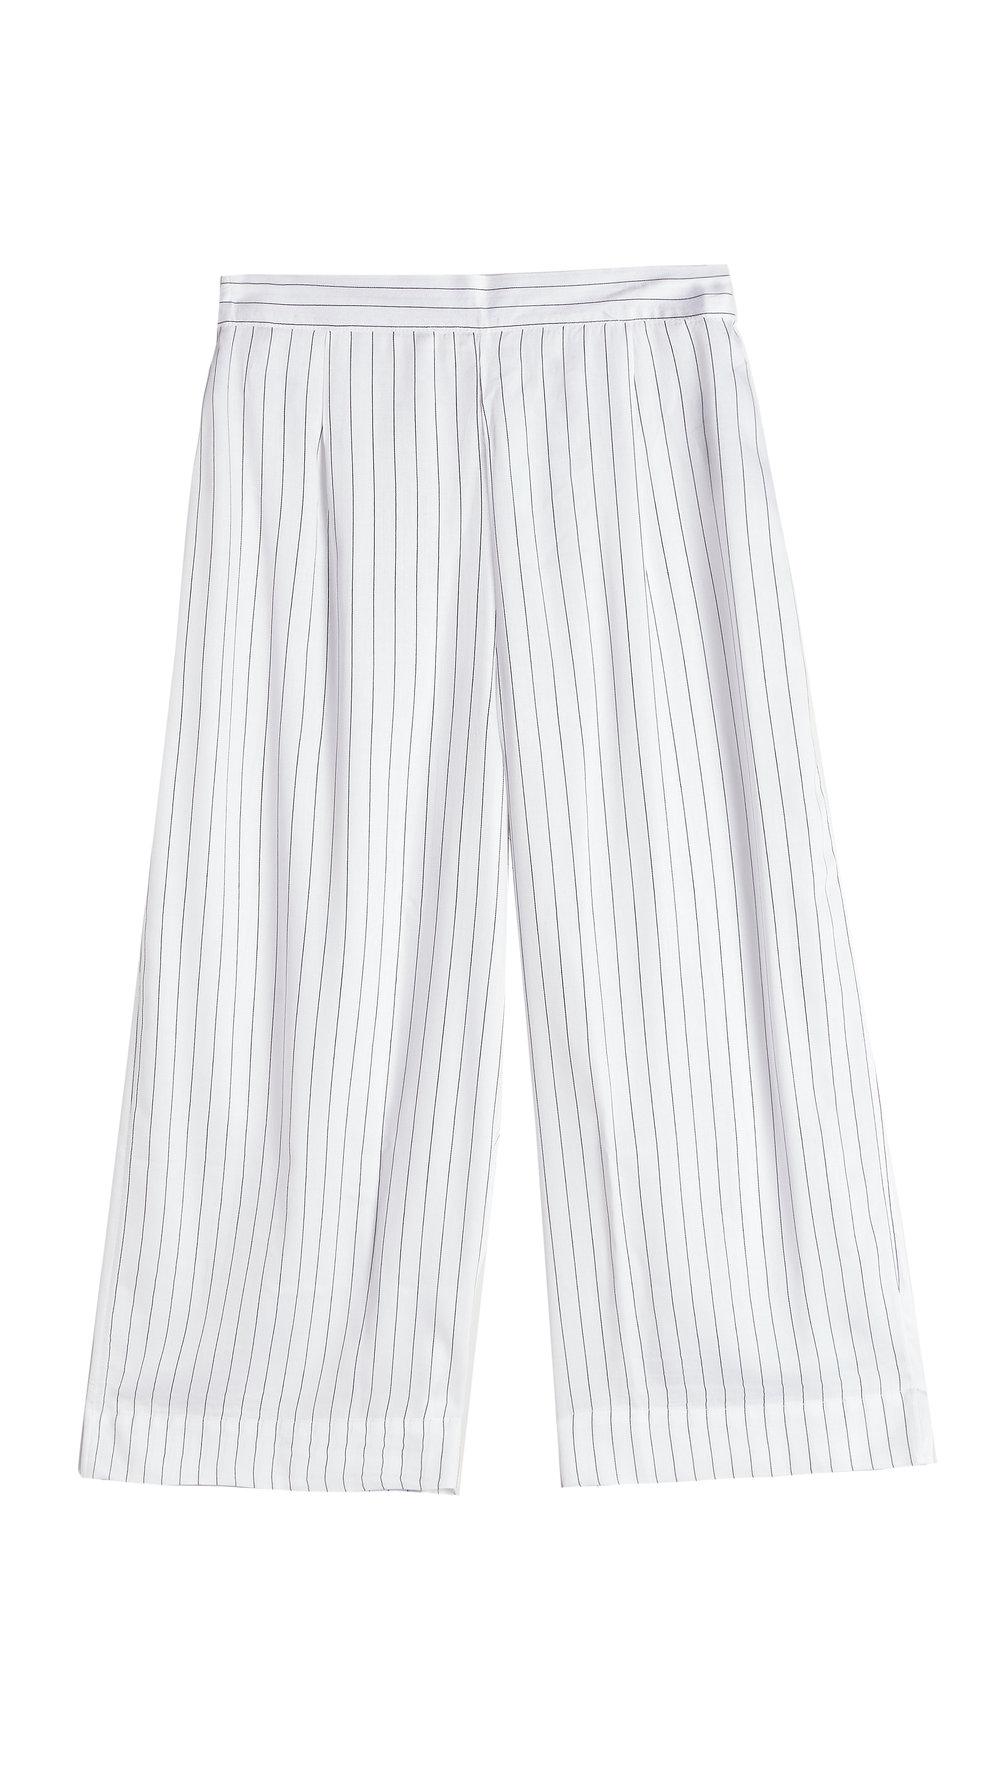 Oysho sleepwear SS17 (6).jpg